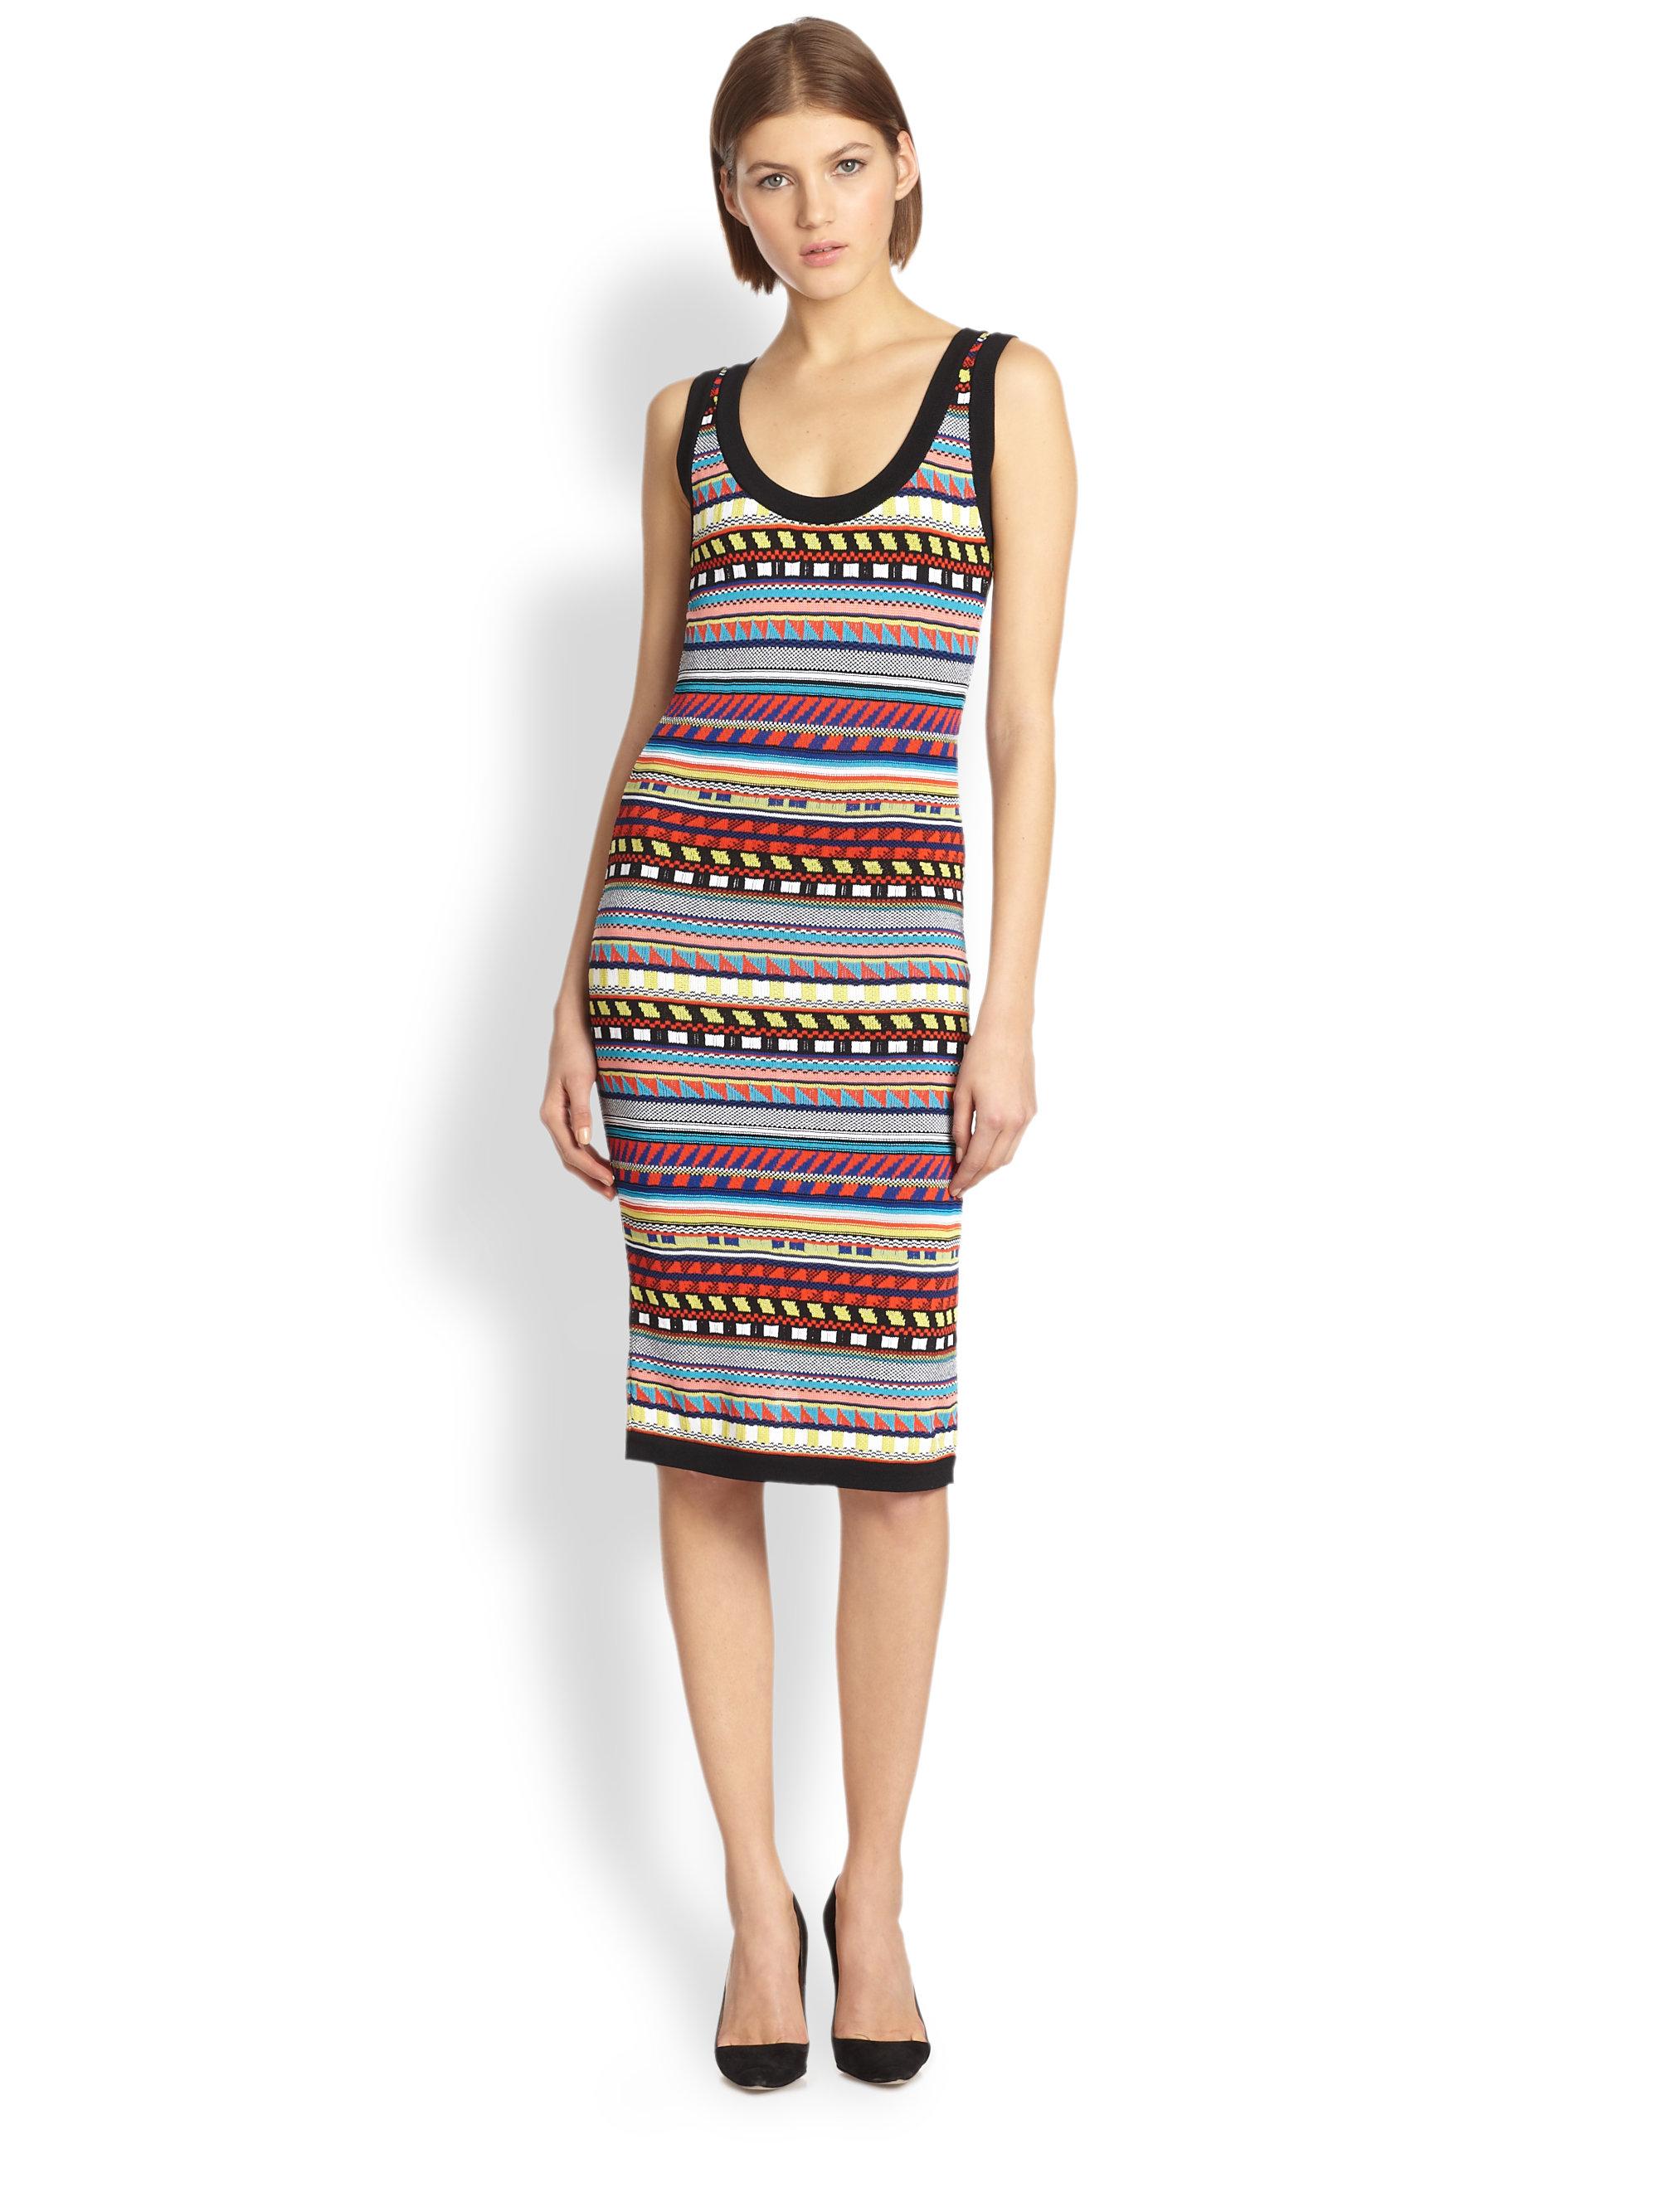 DRESSES - Knee-length dresses Emilio Pucci PaTMG